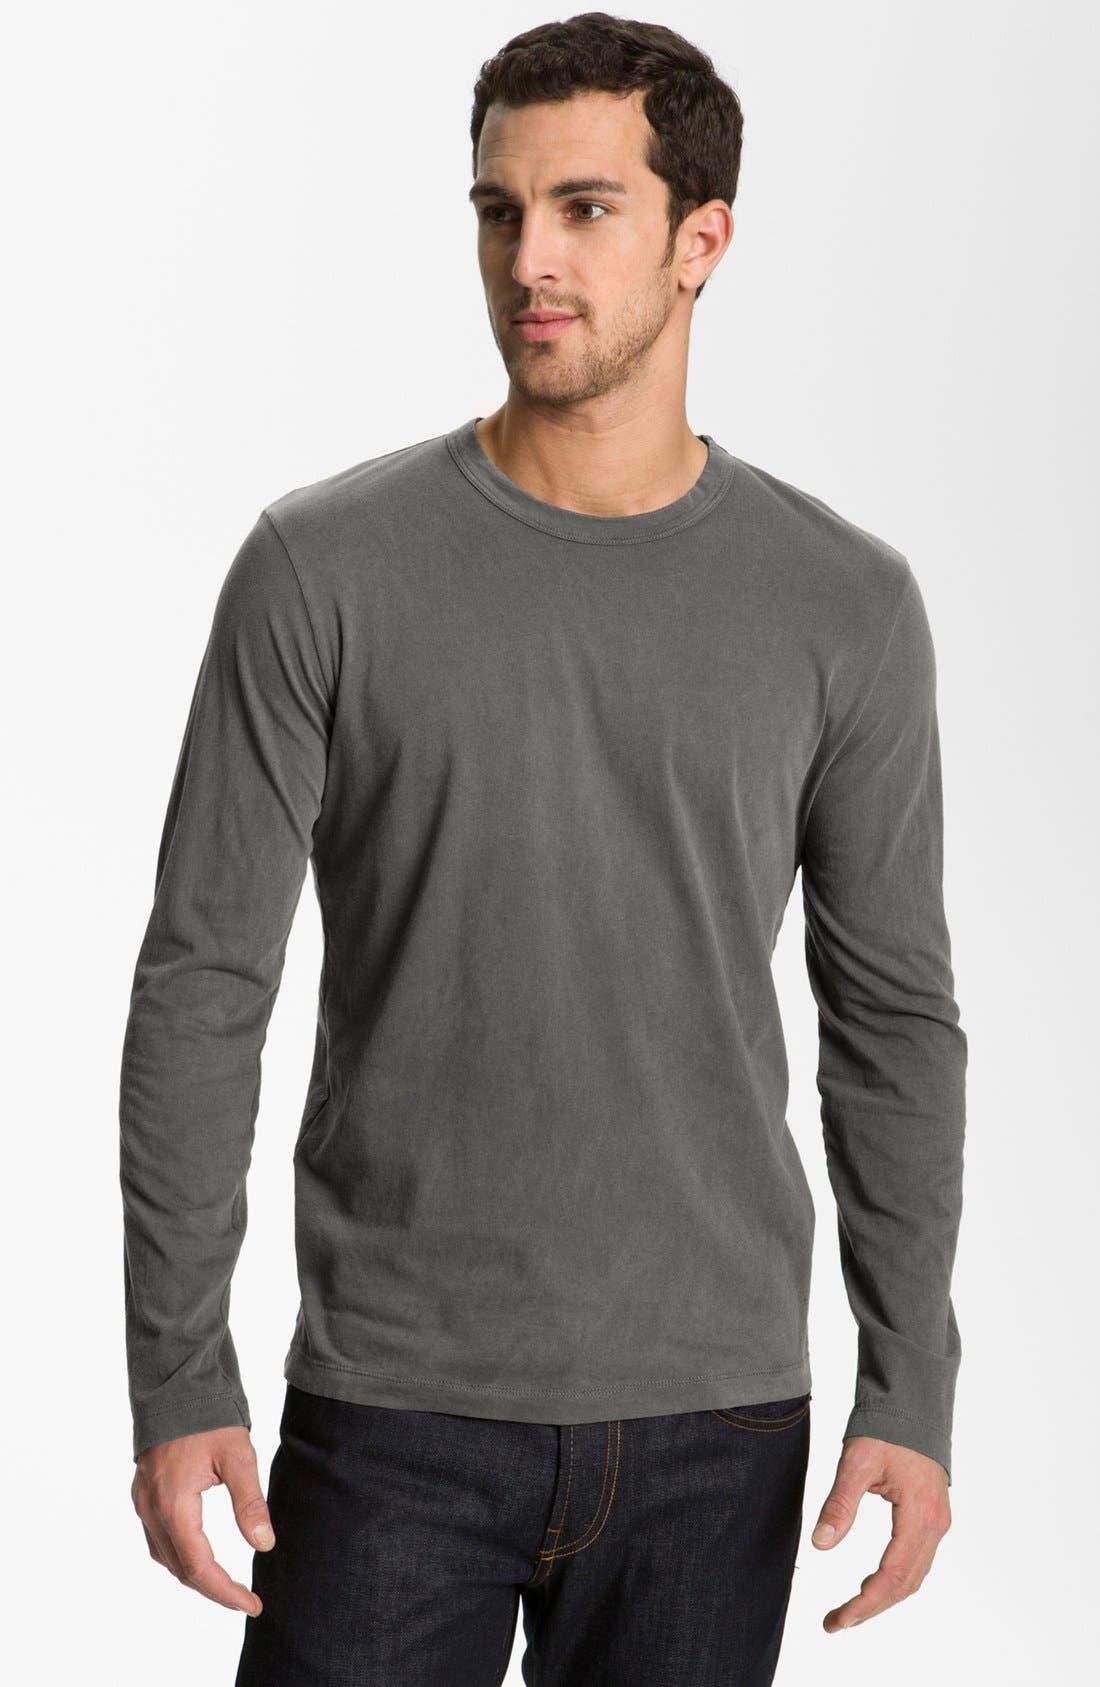 Alternate Image 1 Selected - James Perse Long Sleeve Crewneck T-Shirt